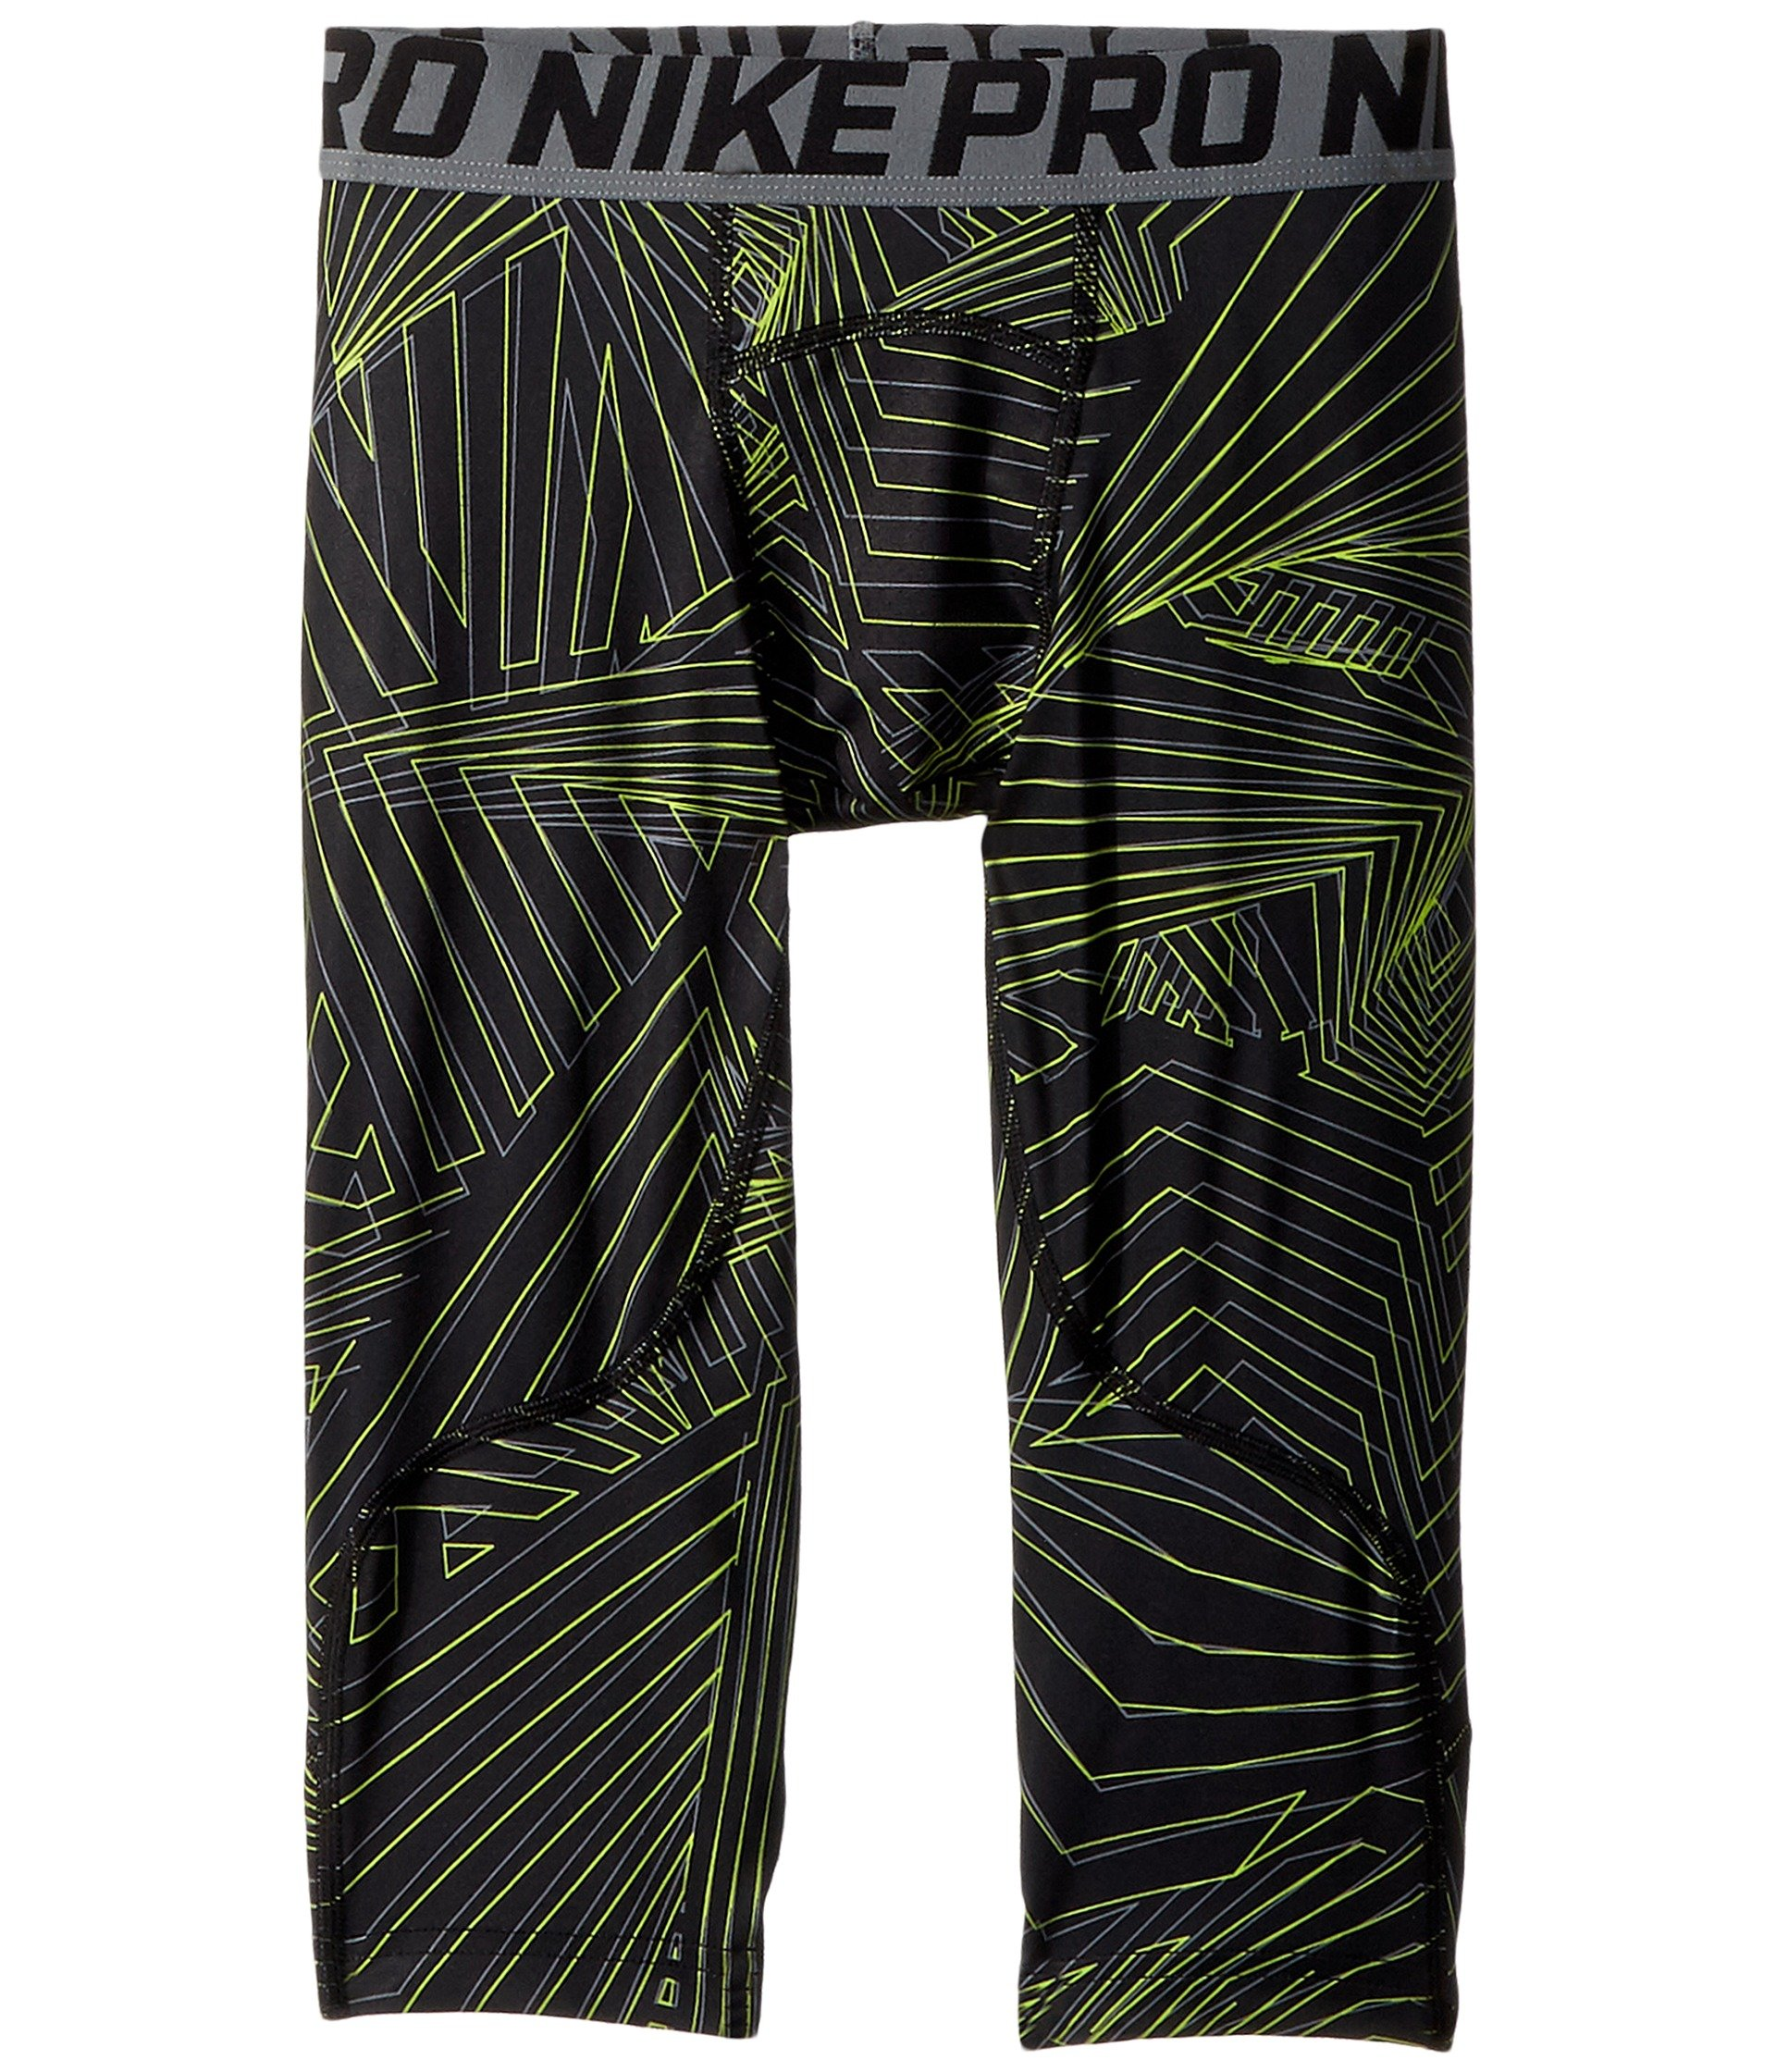 NIKE Pro Boy`s 3/4 Printed Training Leggings (Black (943374-010)/Print Volt/Reflective Silver, Large) by Nike